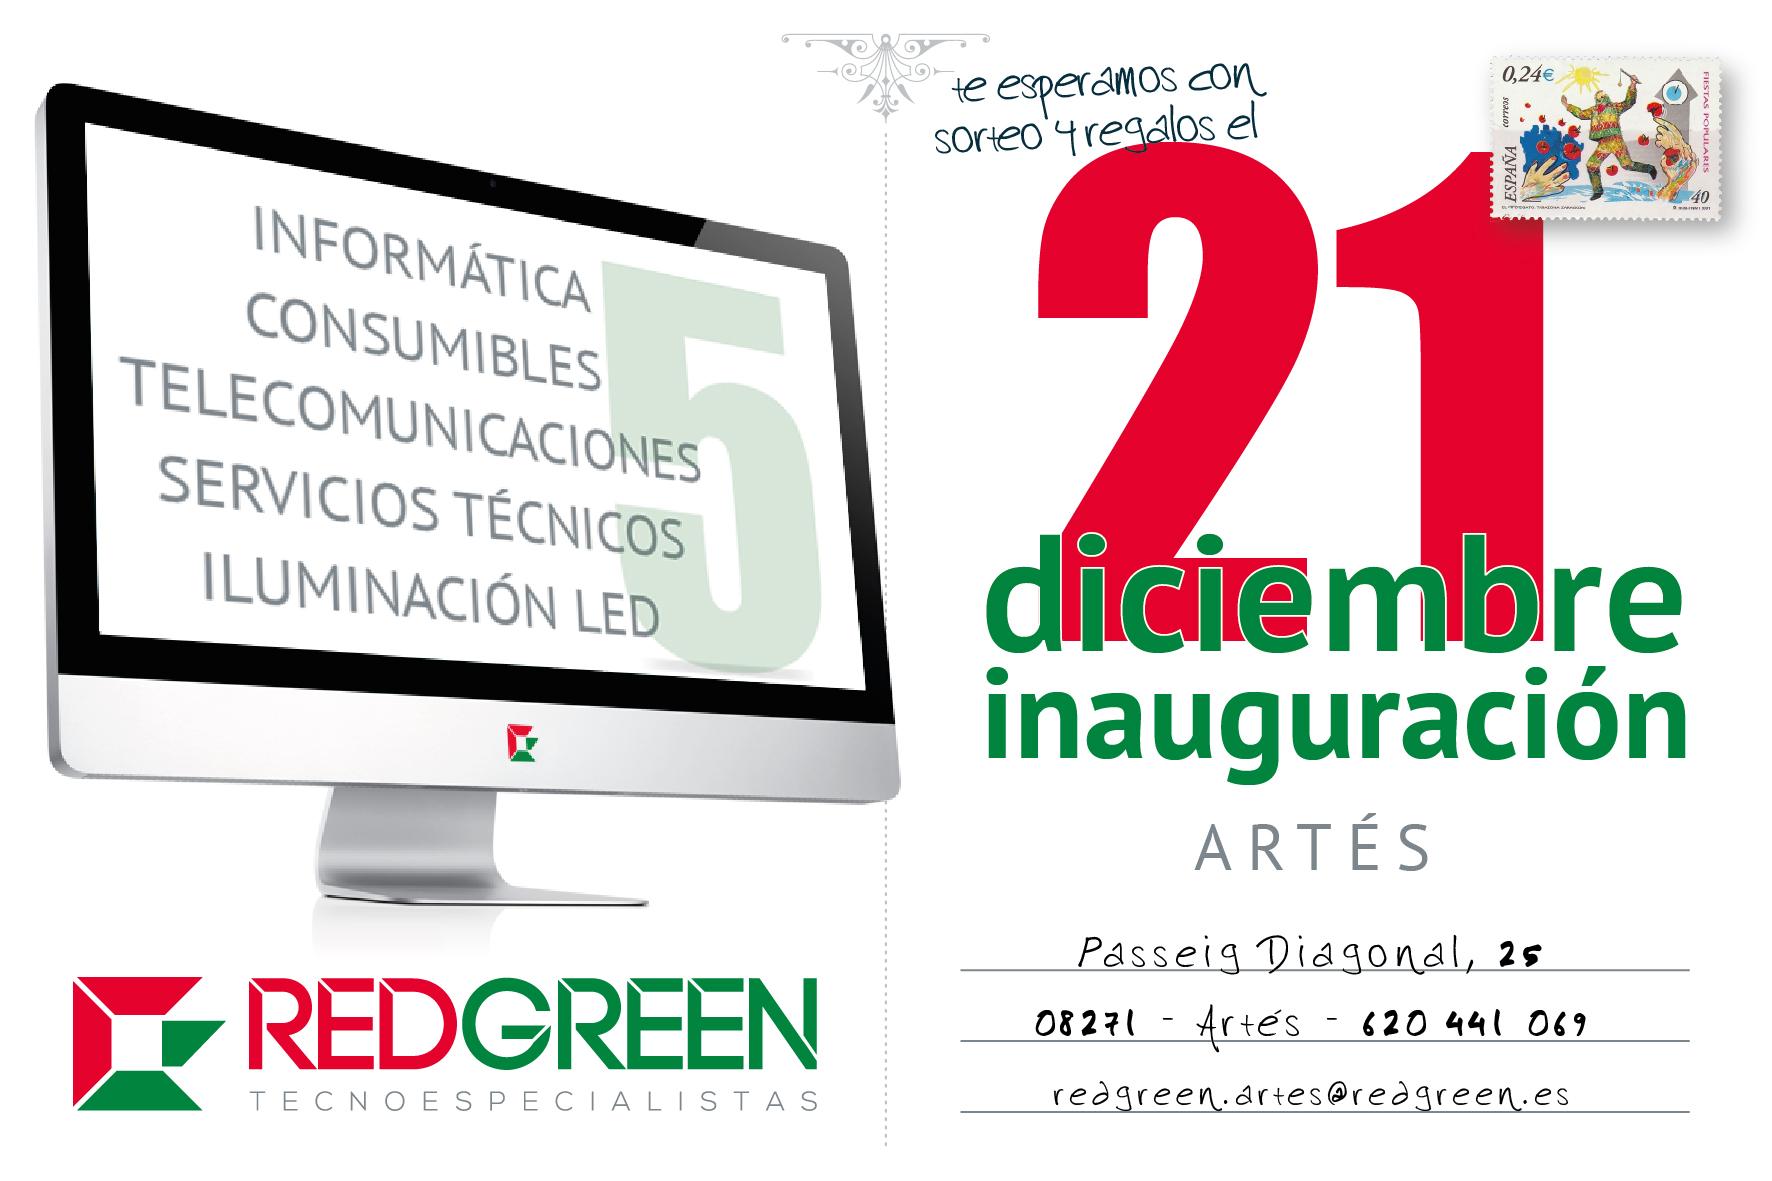 Redgreen inaugura su nueva franquicia REDGREEN ARTÉS